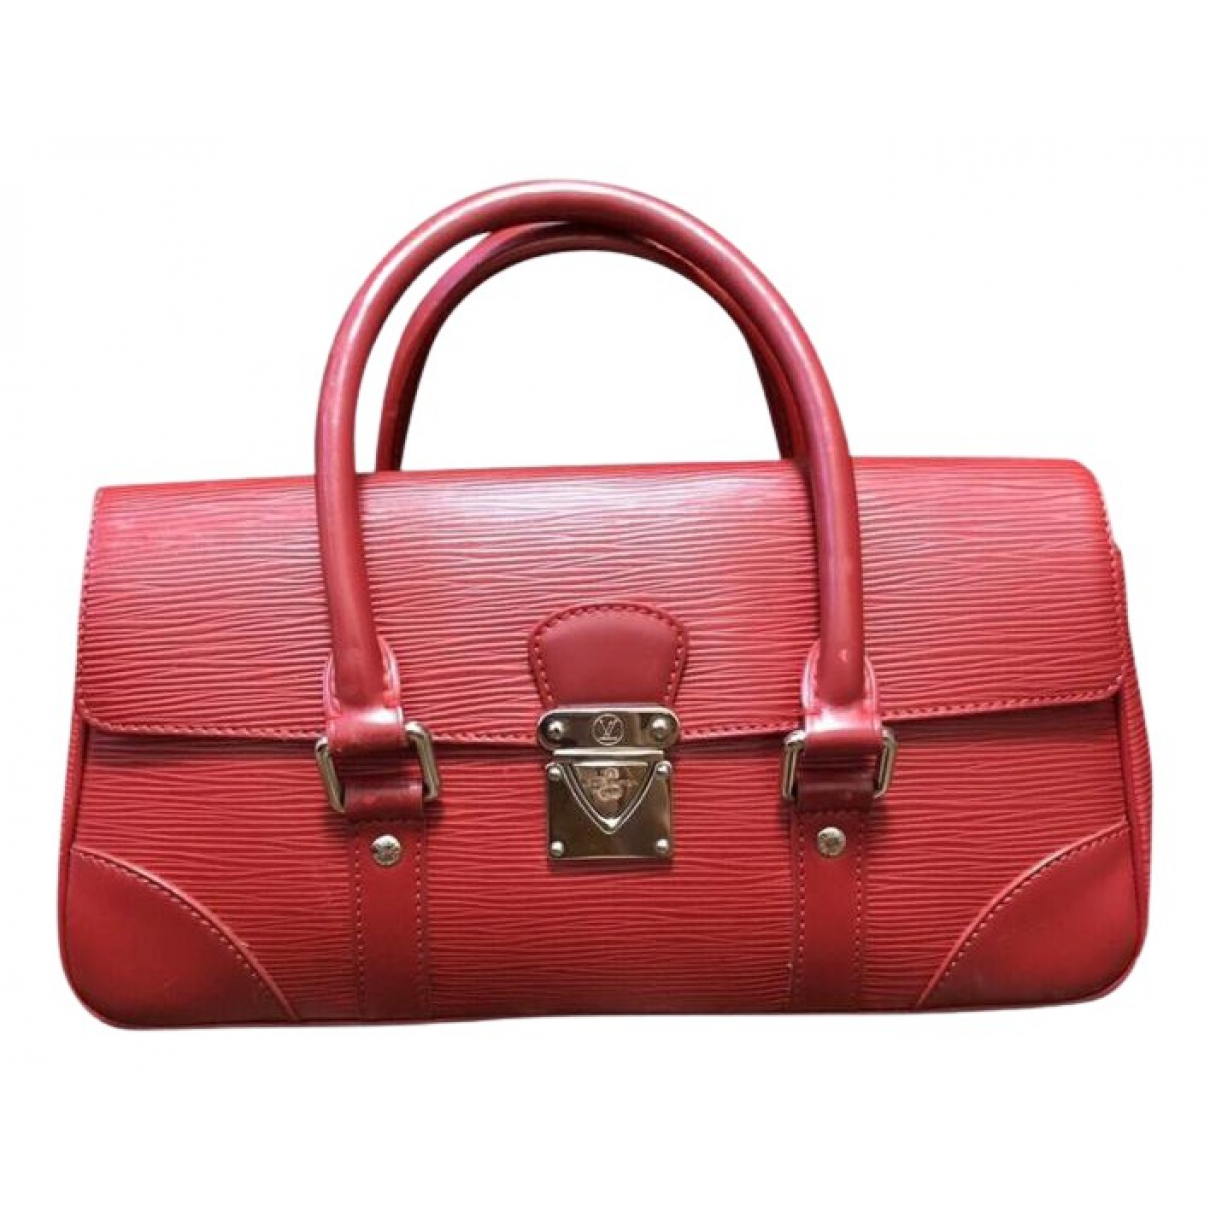 Louis Vuitton Segur Red Leather handbag for Women N